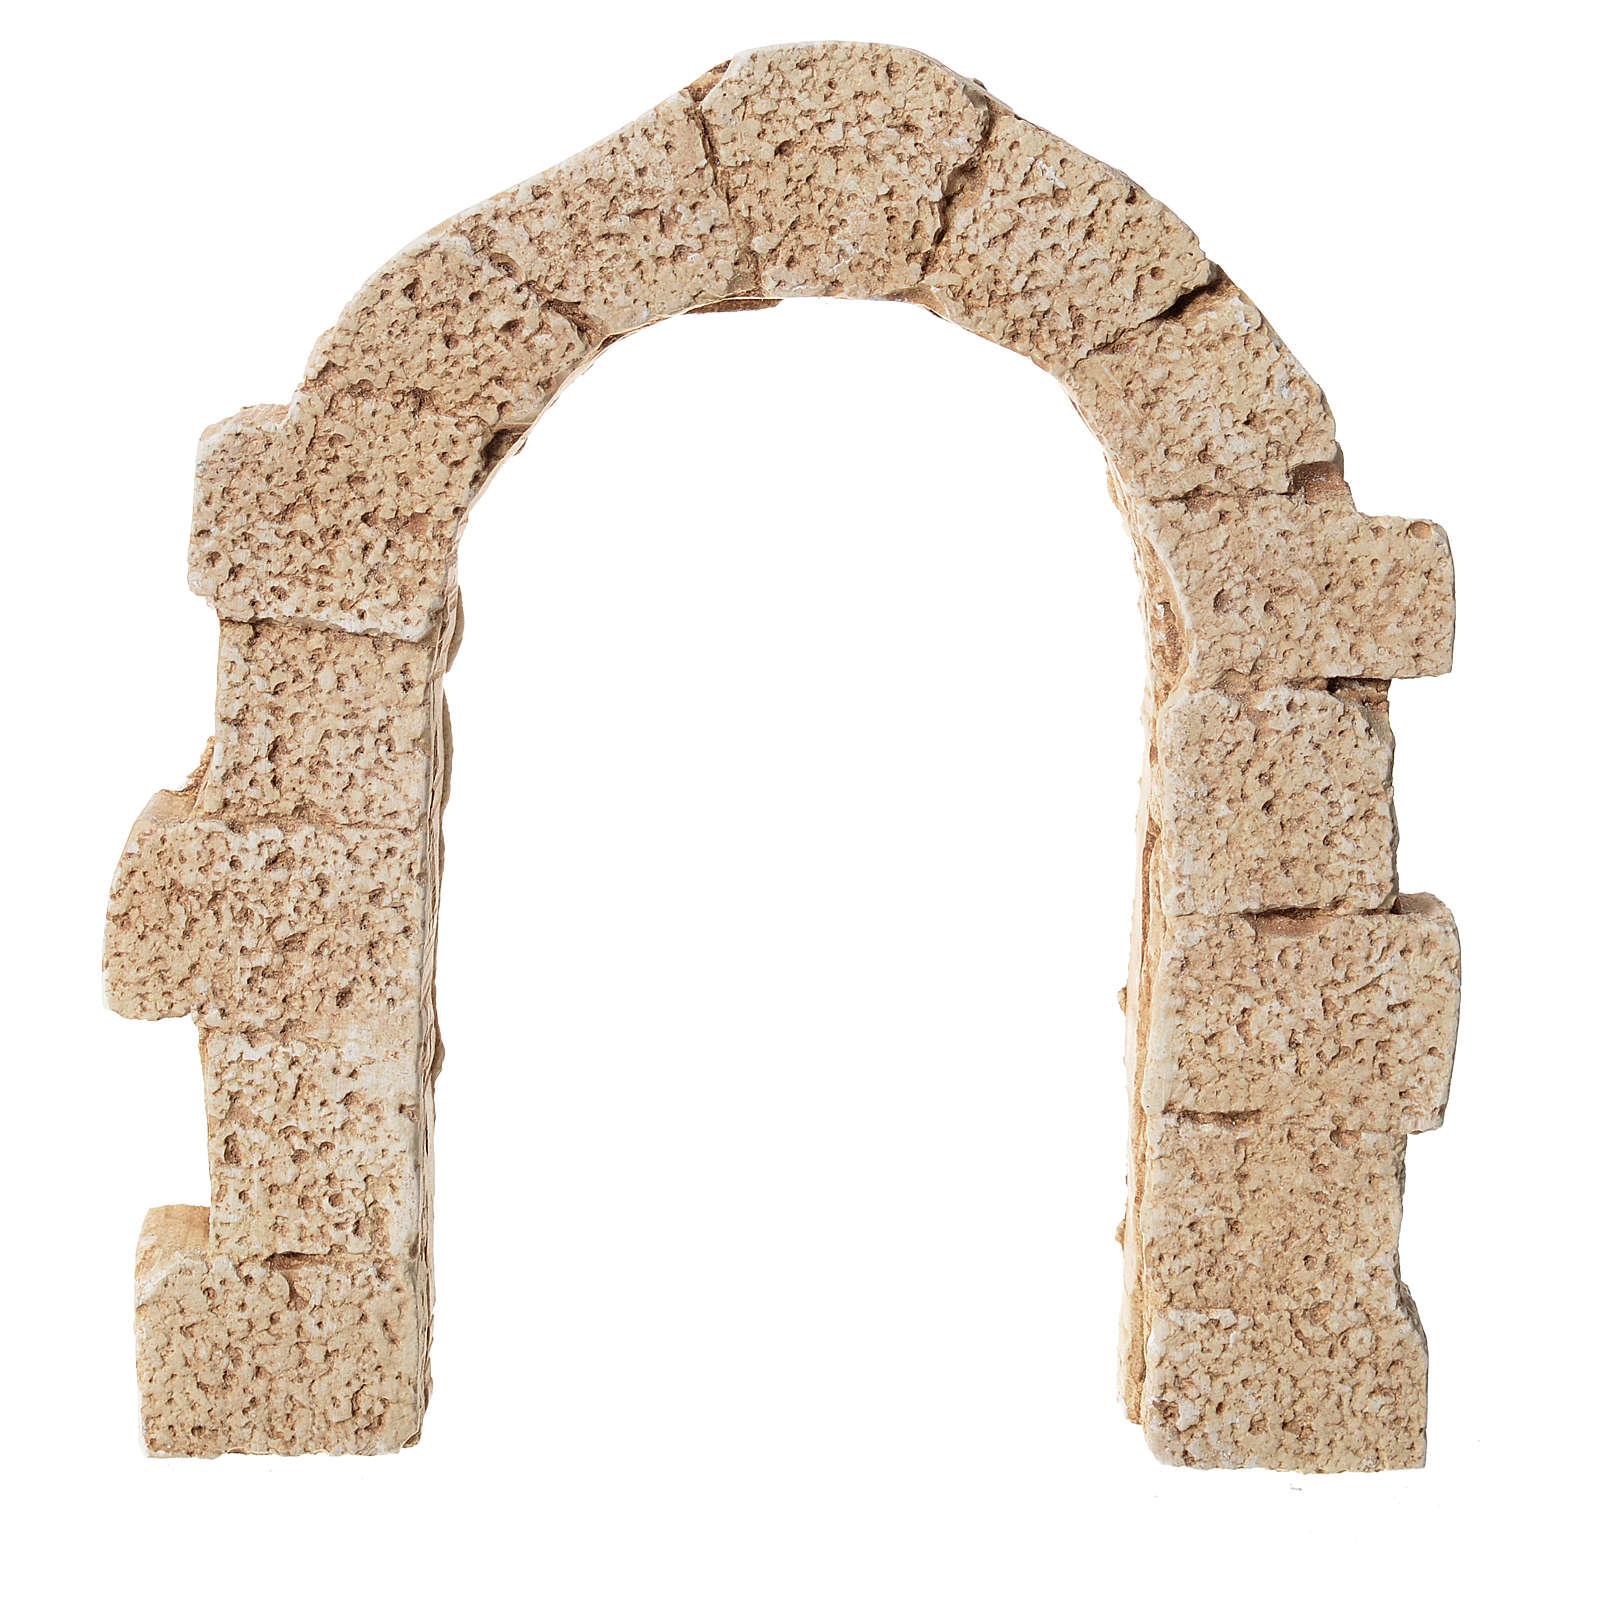 Puerta arco de yeso para belén 11x10 cm 4